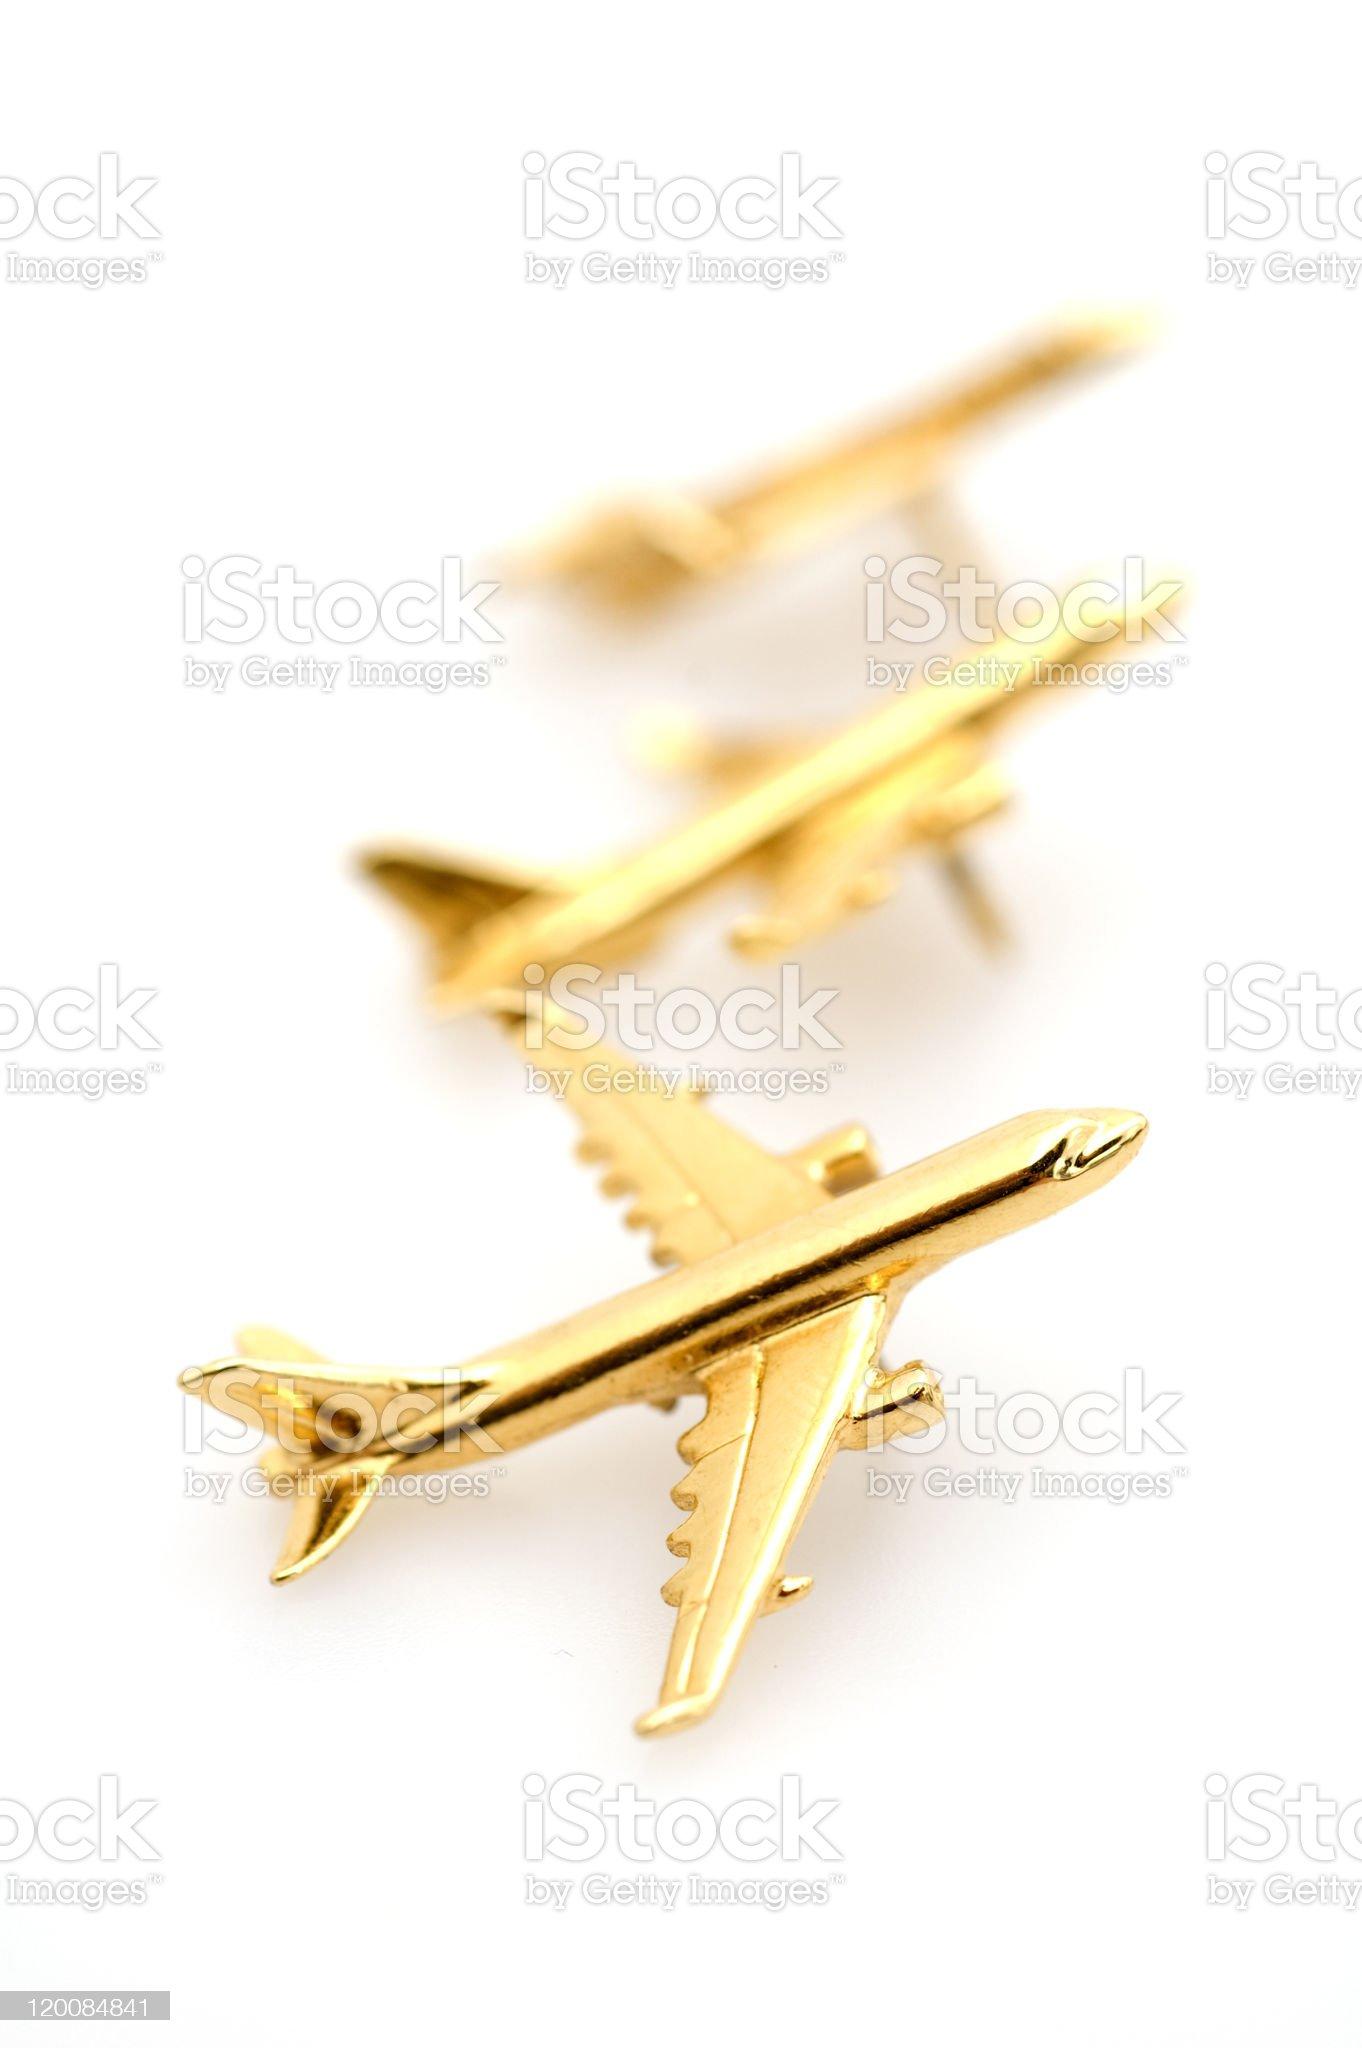 Gold Plane on White Background. royalty-free stock photo